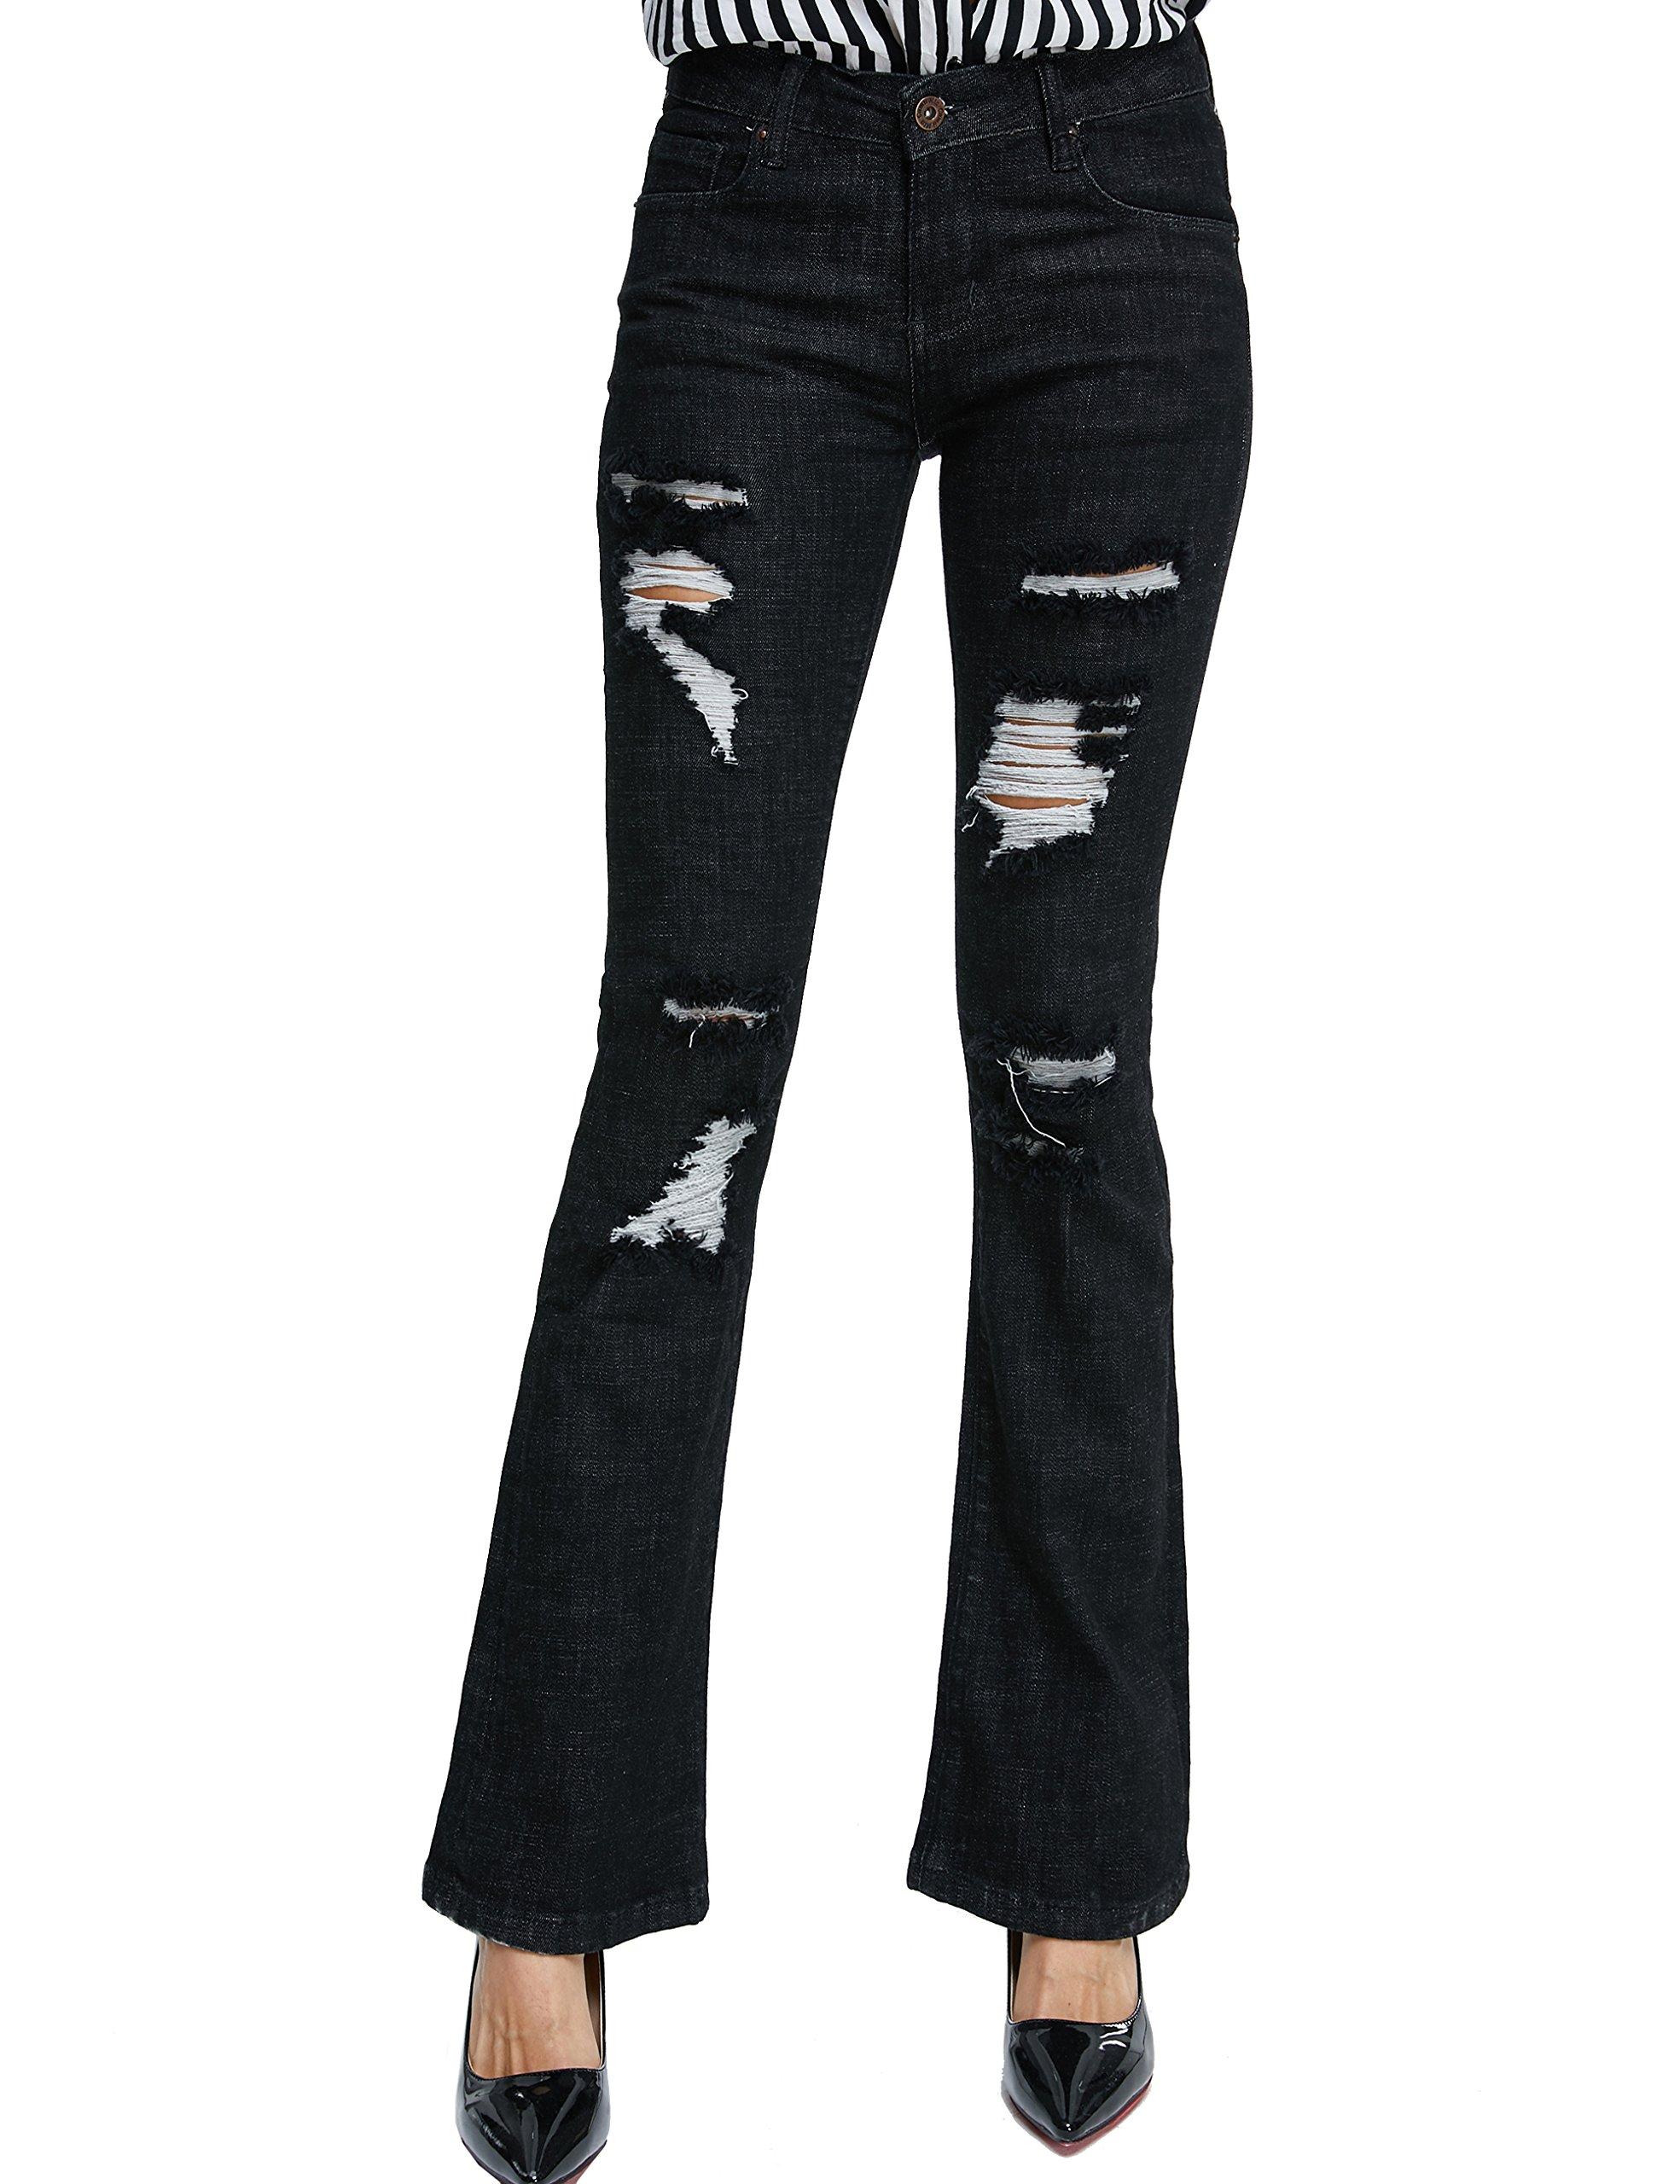 Camii Mia Women's Stretch Distressed Slim Fit Skinny Bootcut Denim Jeans (W28 x L30, Black)